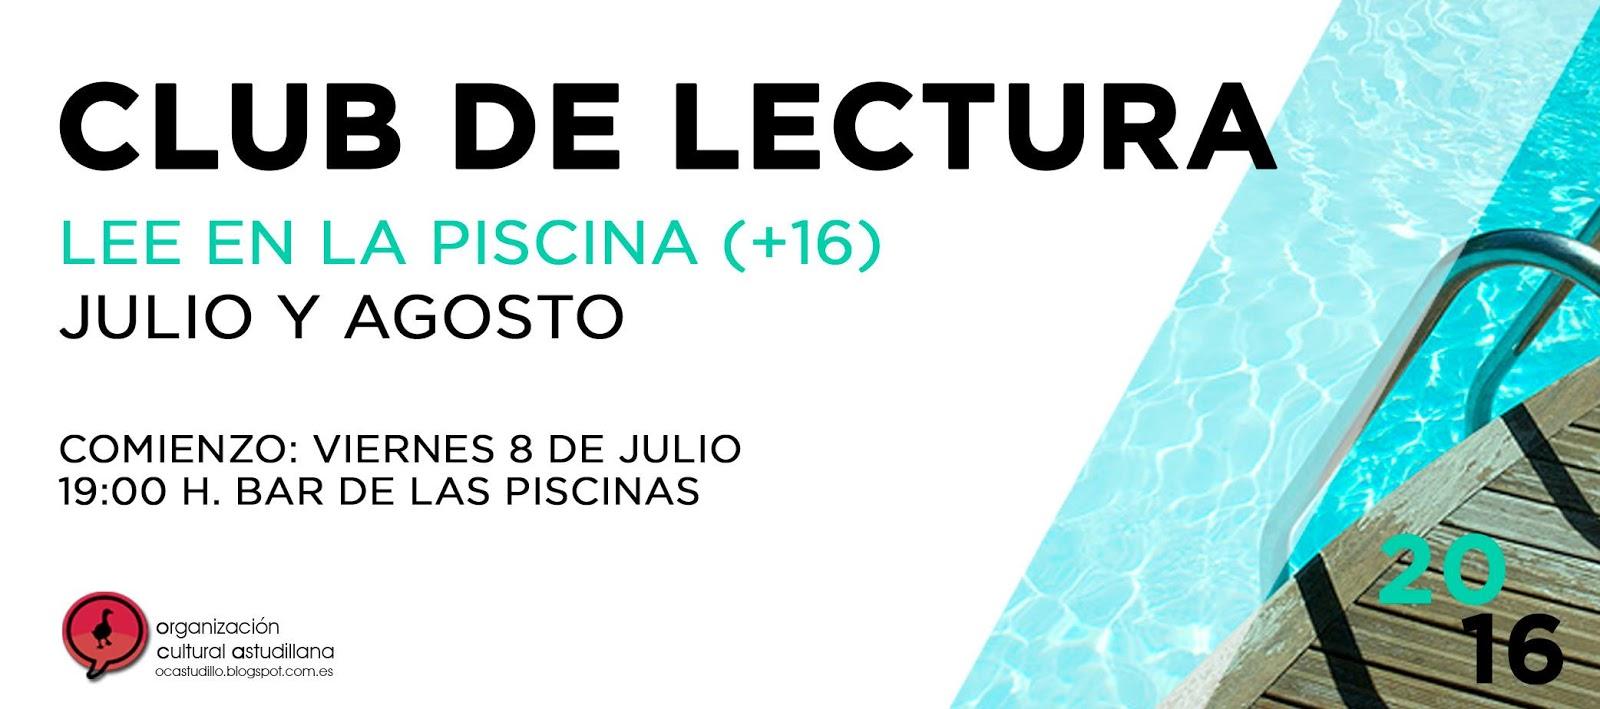 Turismo astudillo verano cultural viernes 8 de julio for Alberca 8 de julio